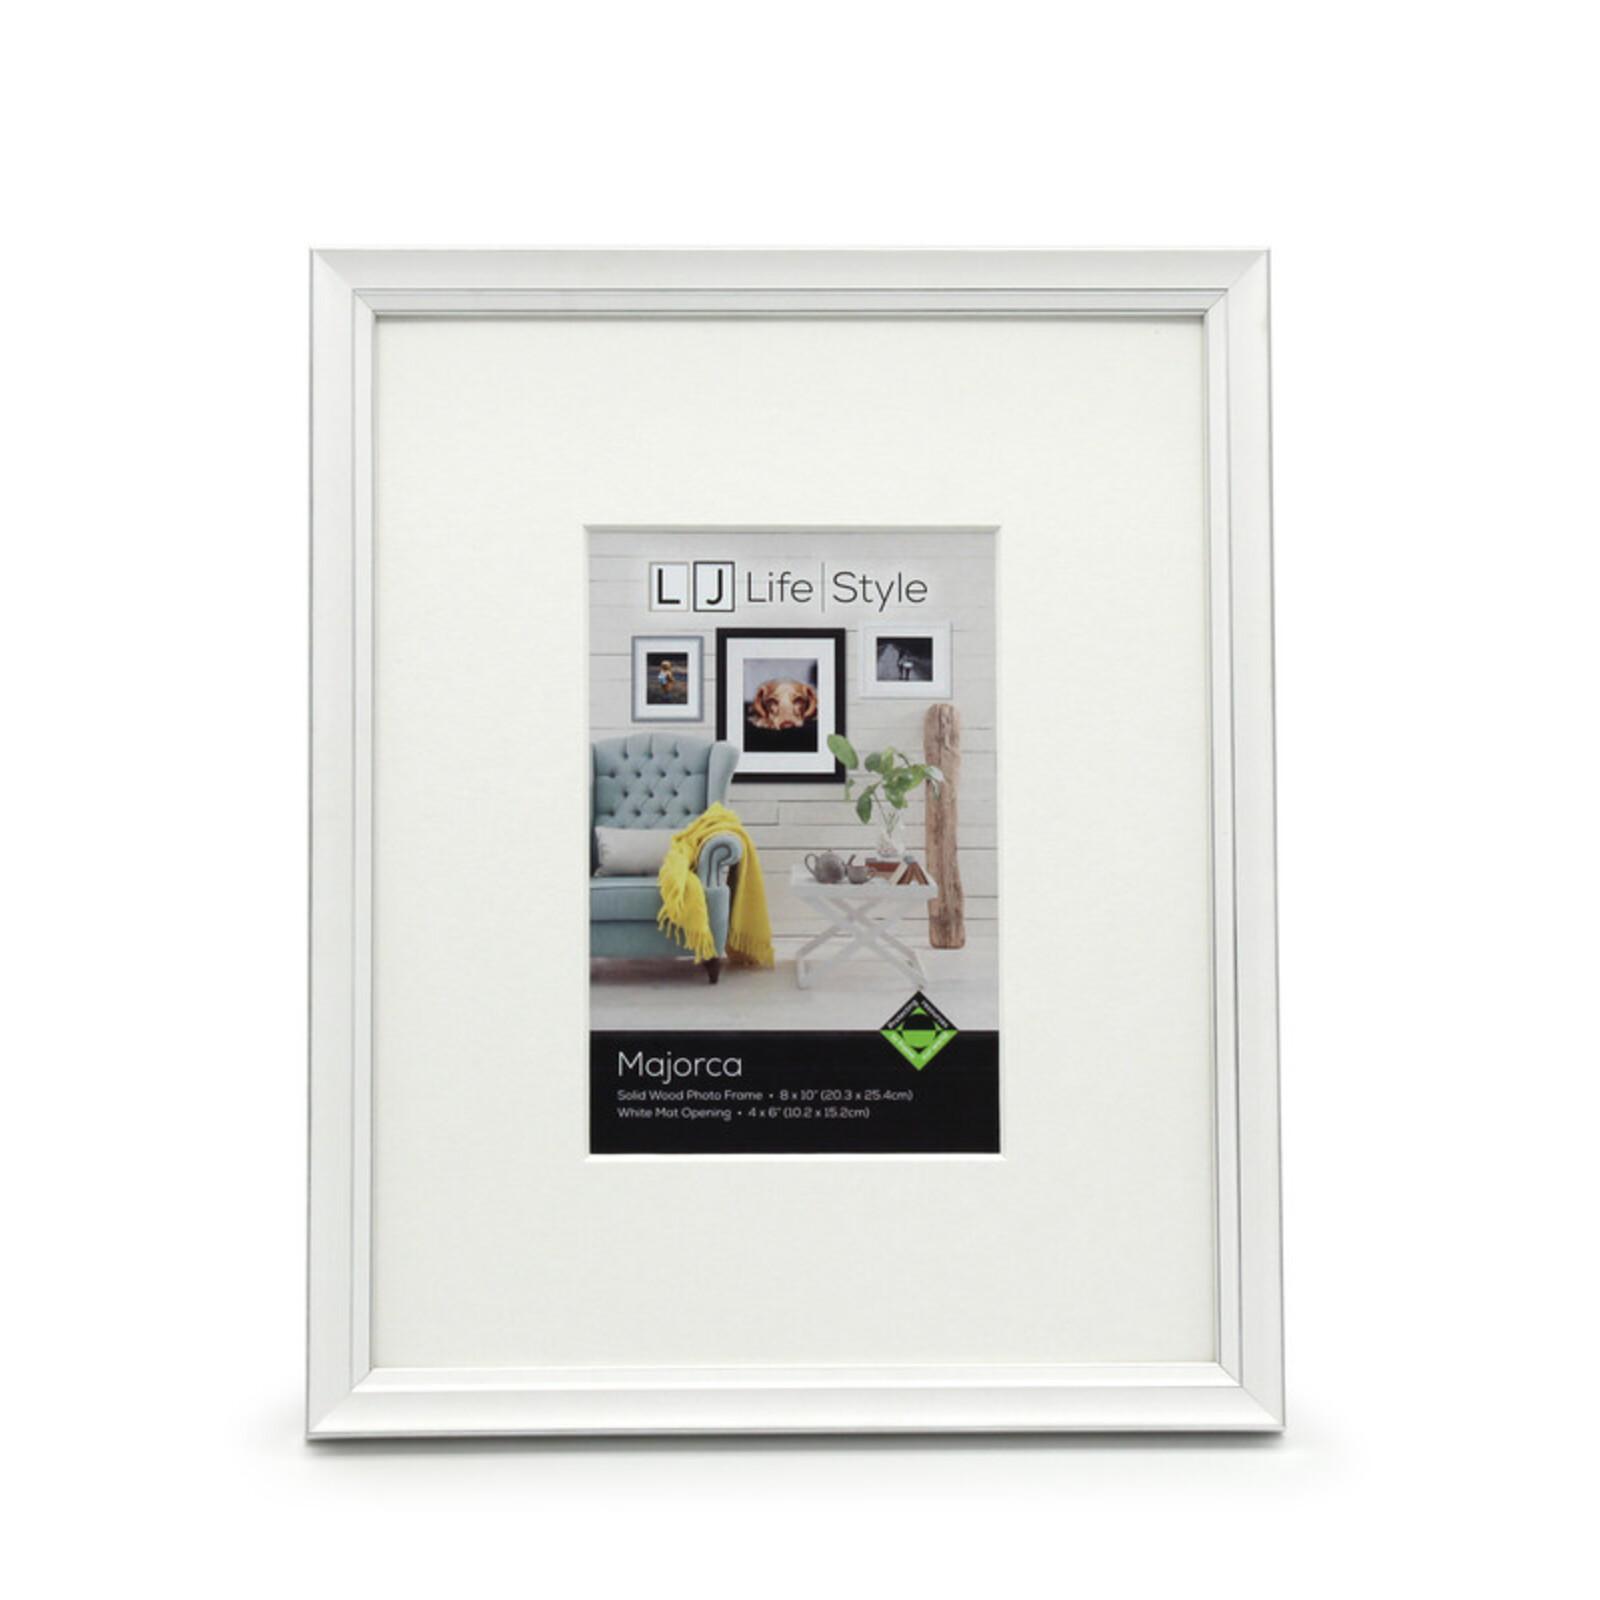 Majorca 8 x 10inch/4 x 6inch Opening White Photo Frame